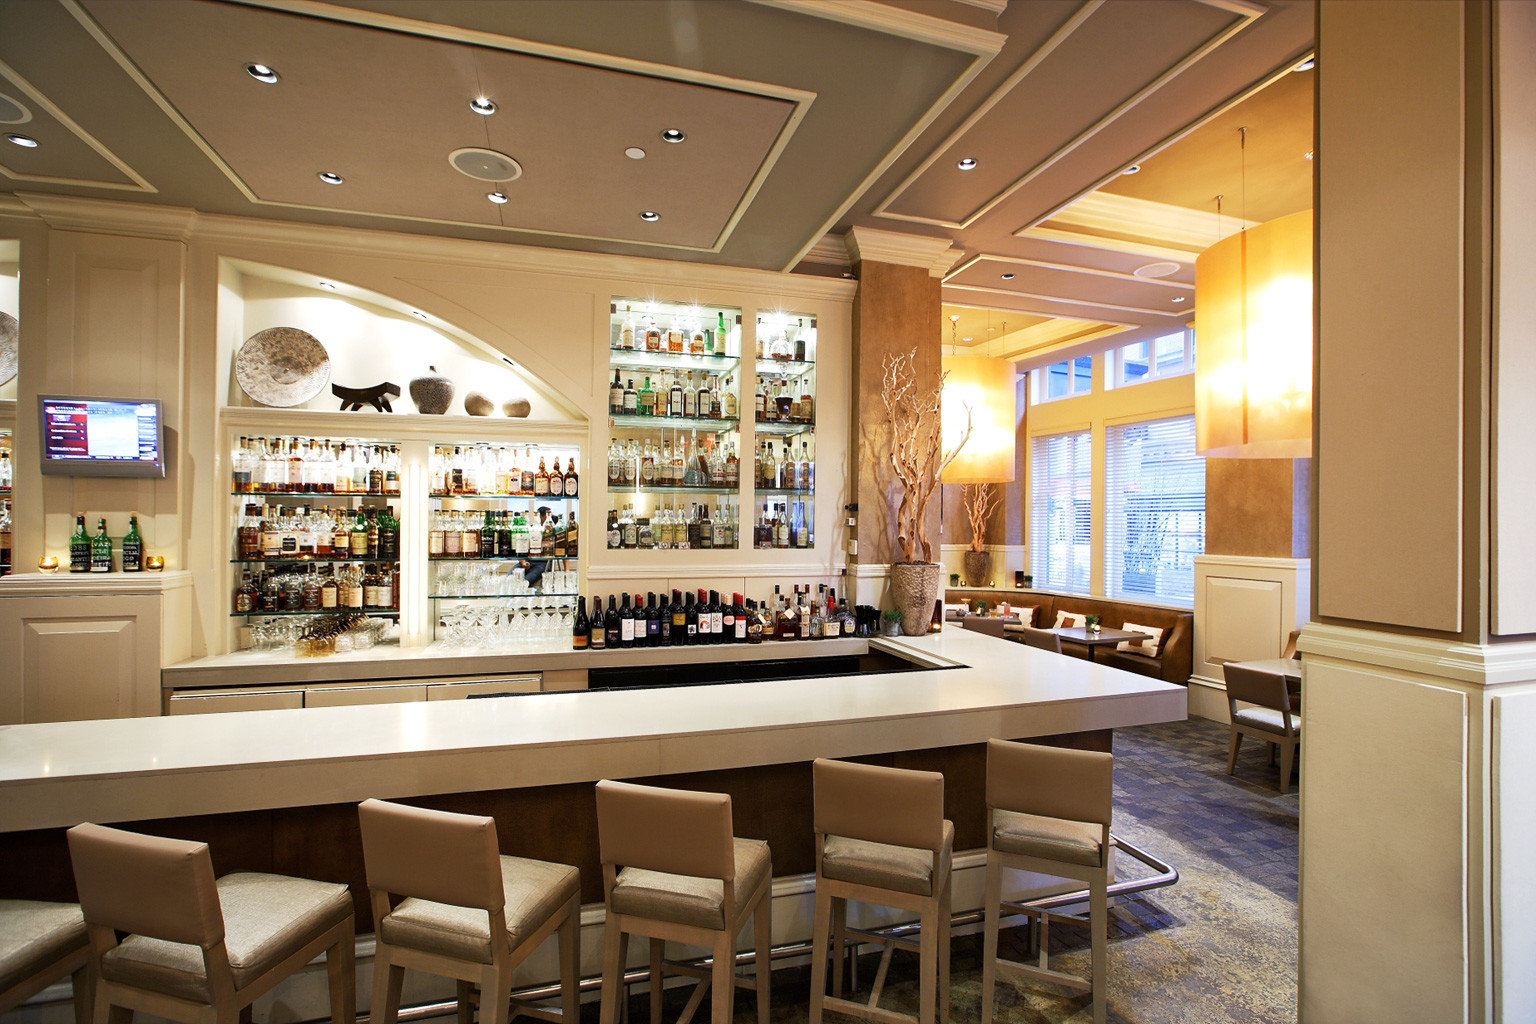 Bar Business Dining Drink Eat Historic Luxury Modern Romantic restaurant Island